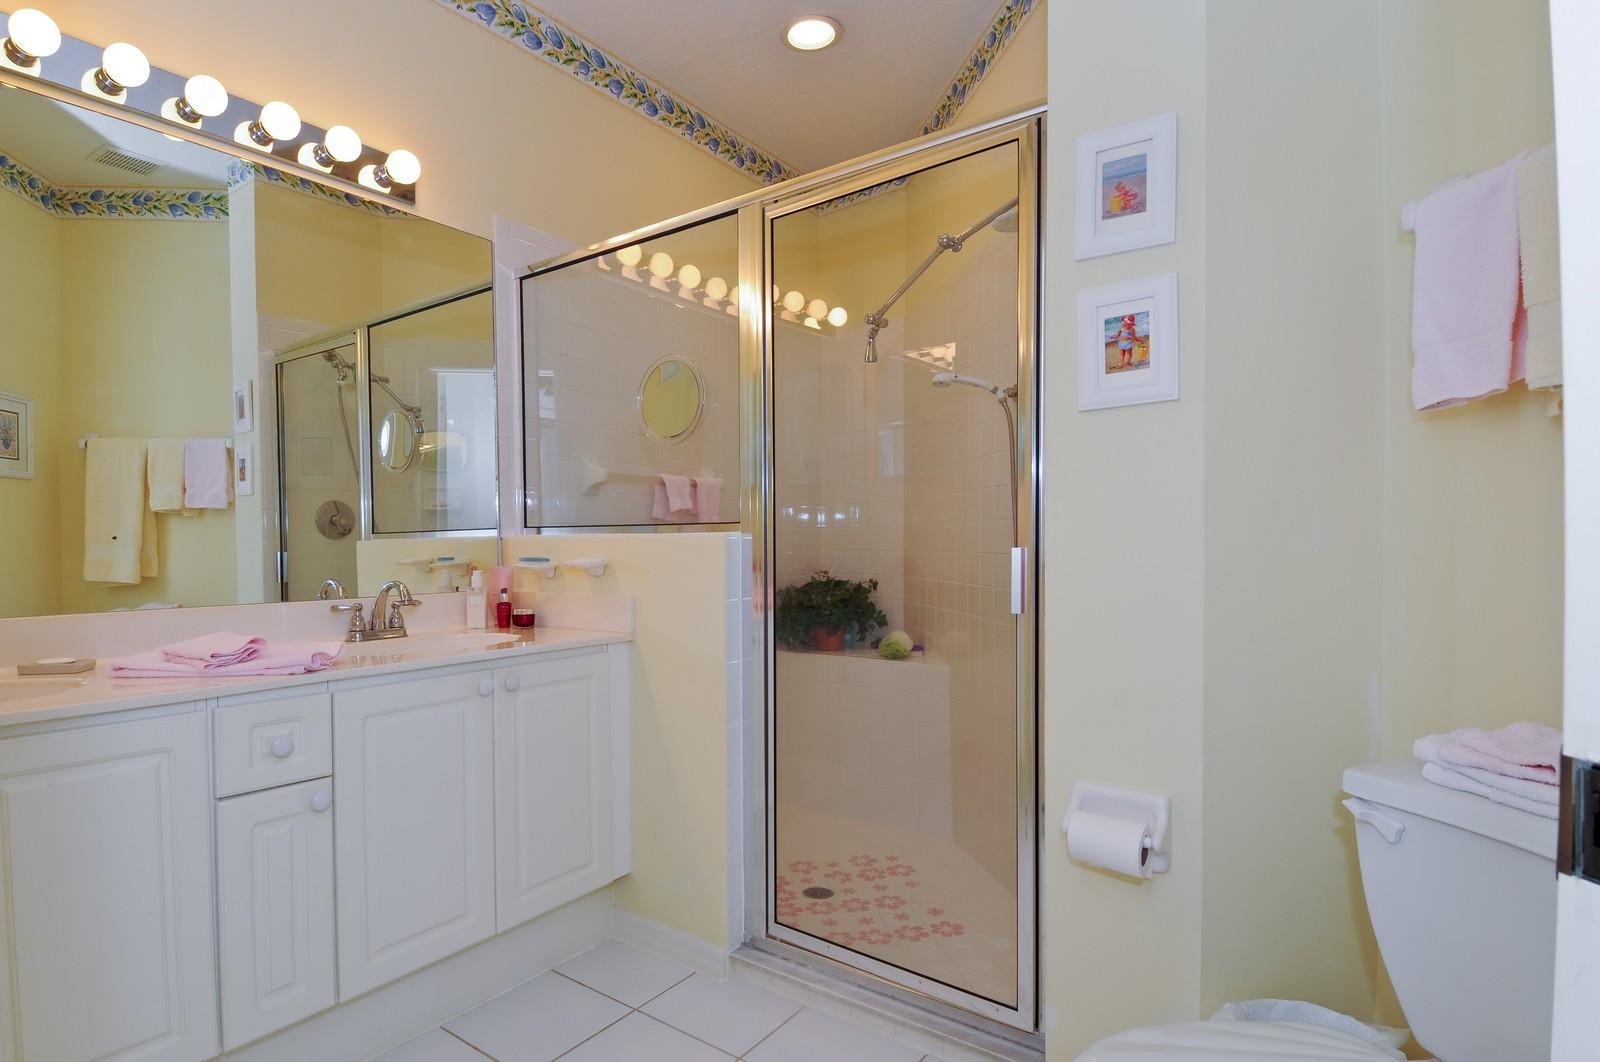 Real Estate Photography - 13060 Hamilton Harbour Dr., H-5, Naples, FL, 34110 - Master Bathroom